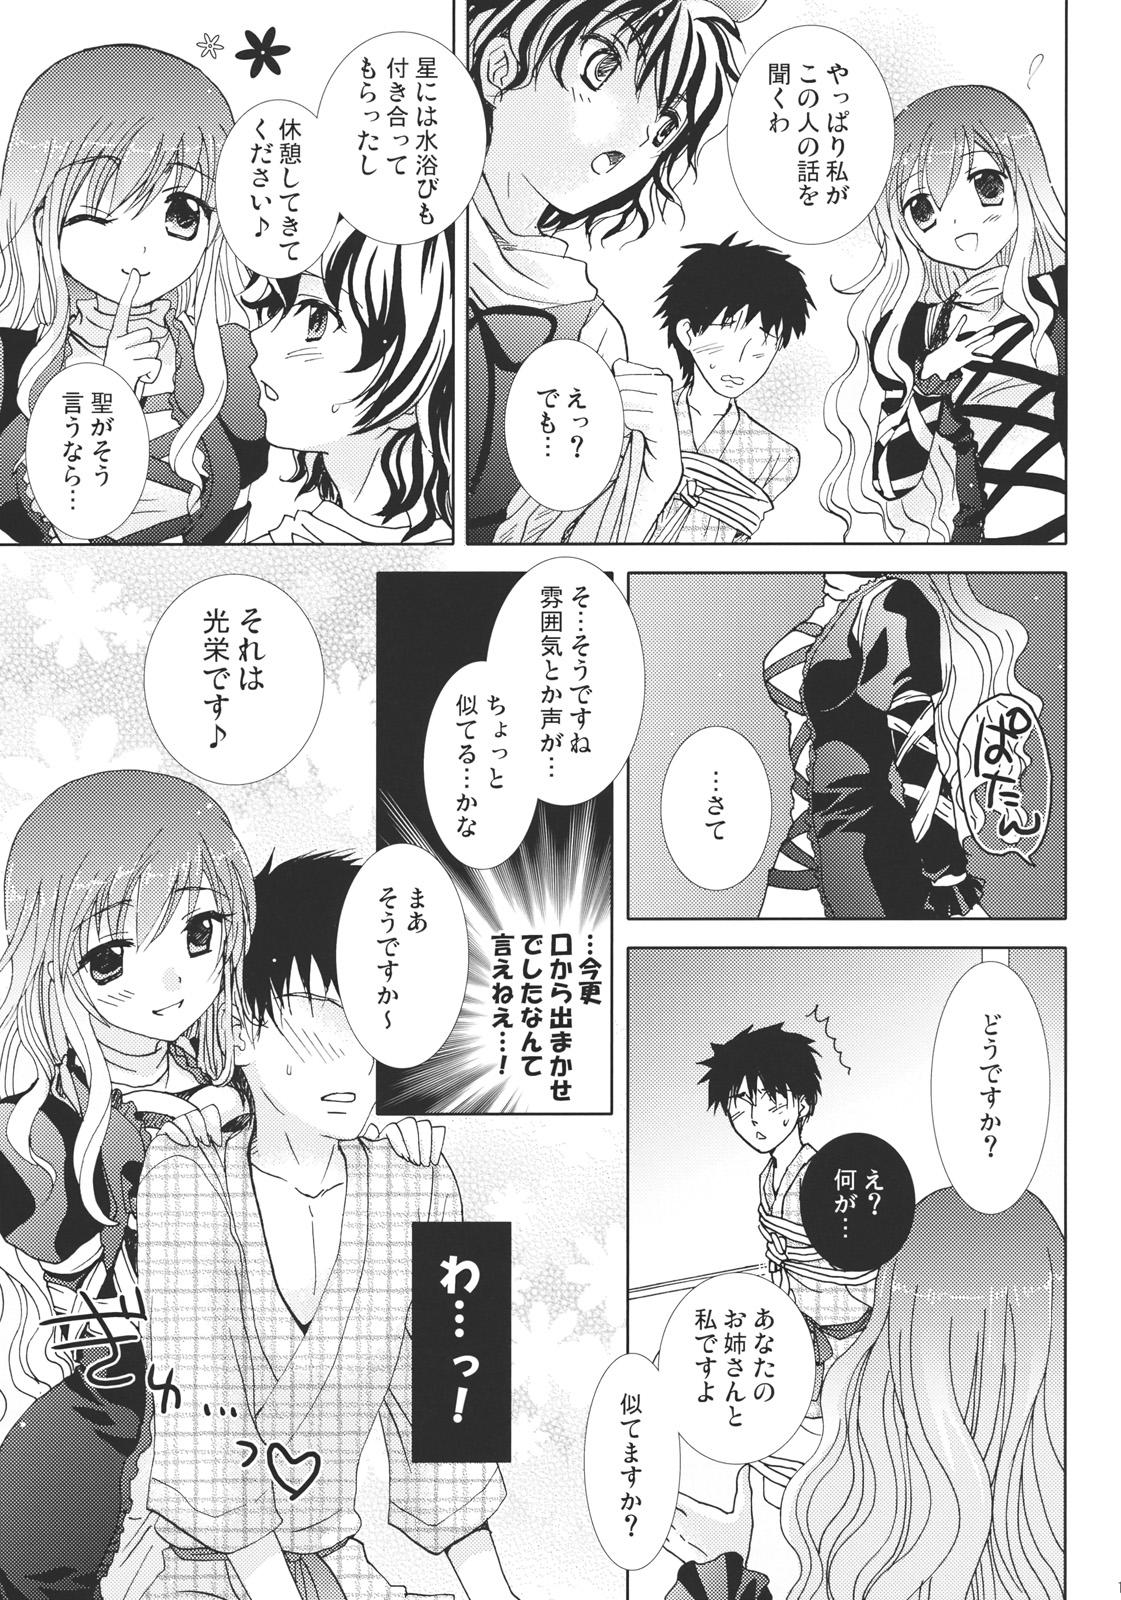 Majutsushi Gensou 12